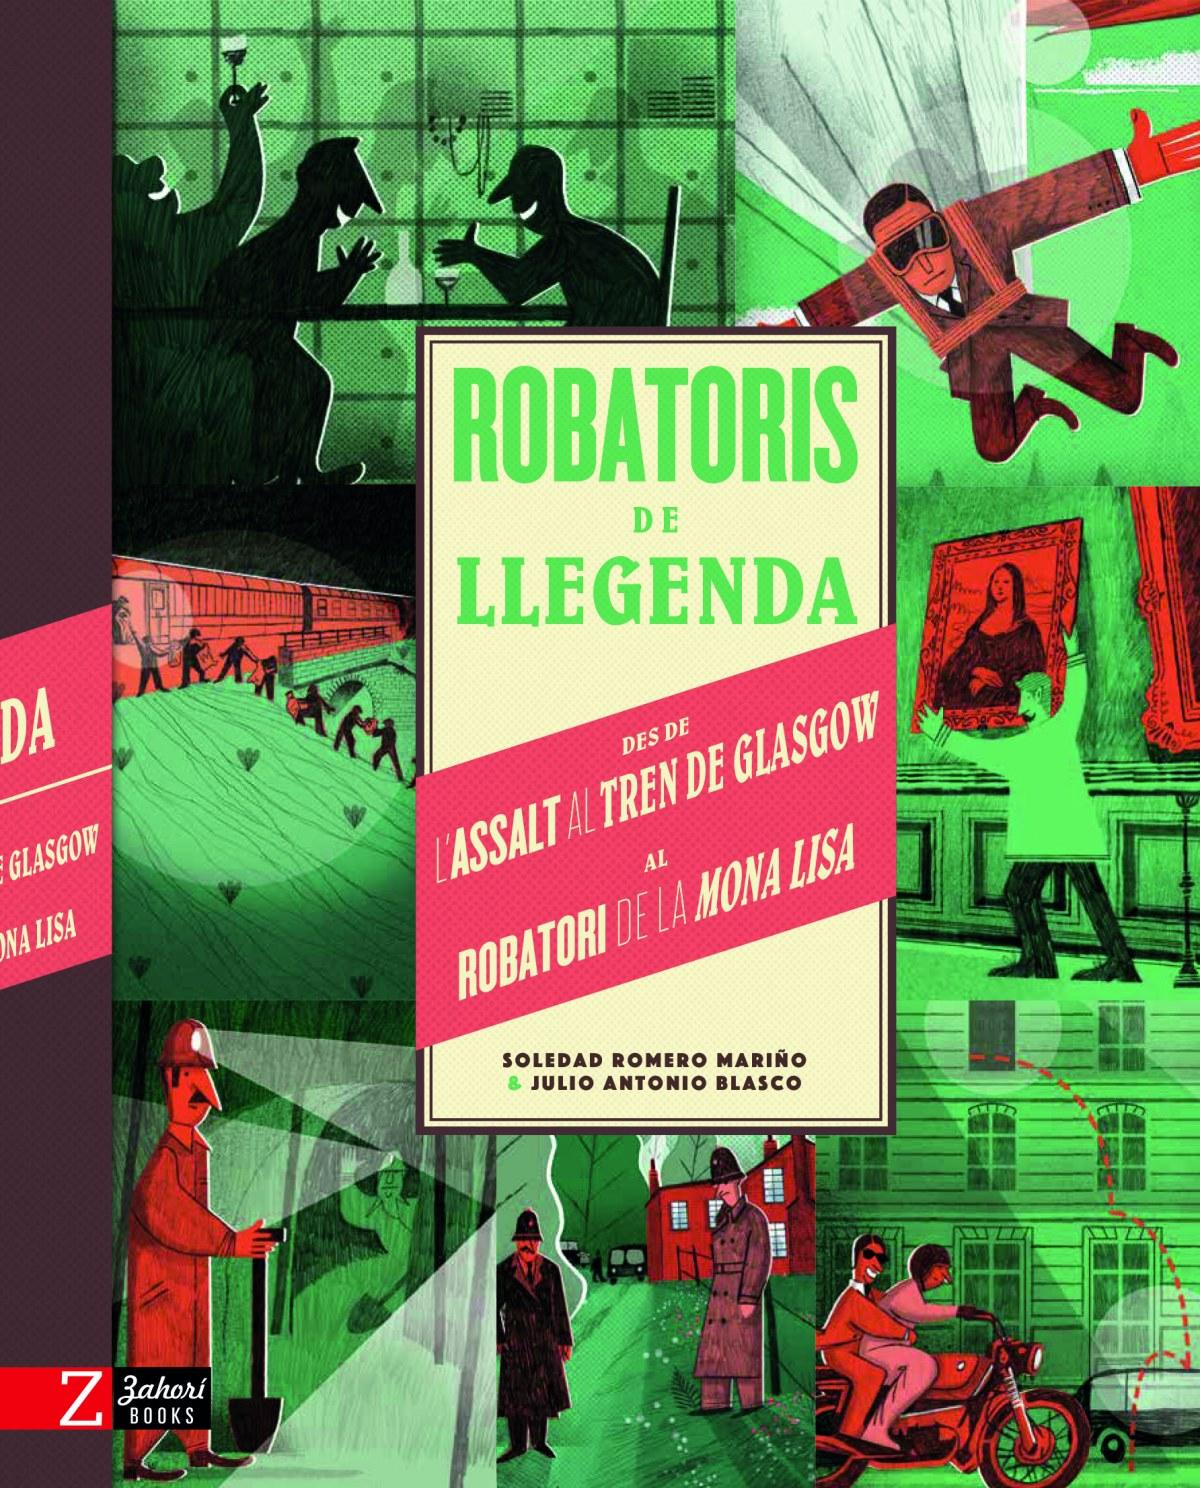 ROBATORIS DE LLEGENDA